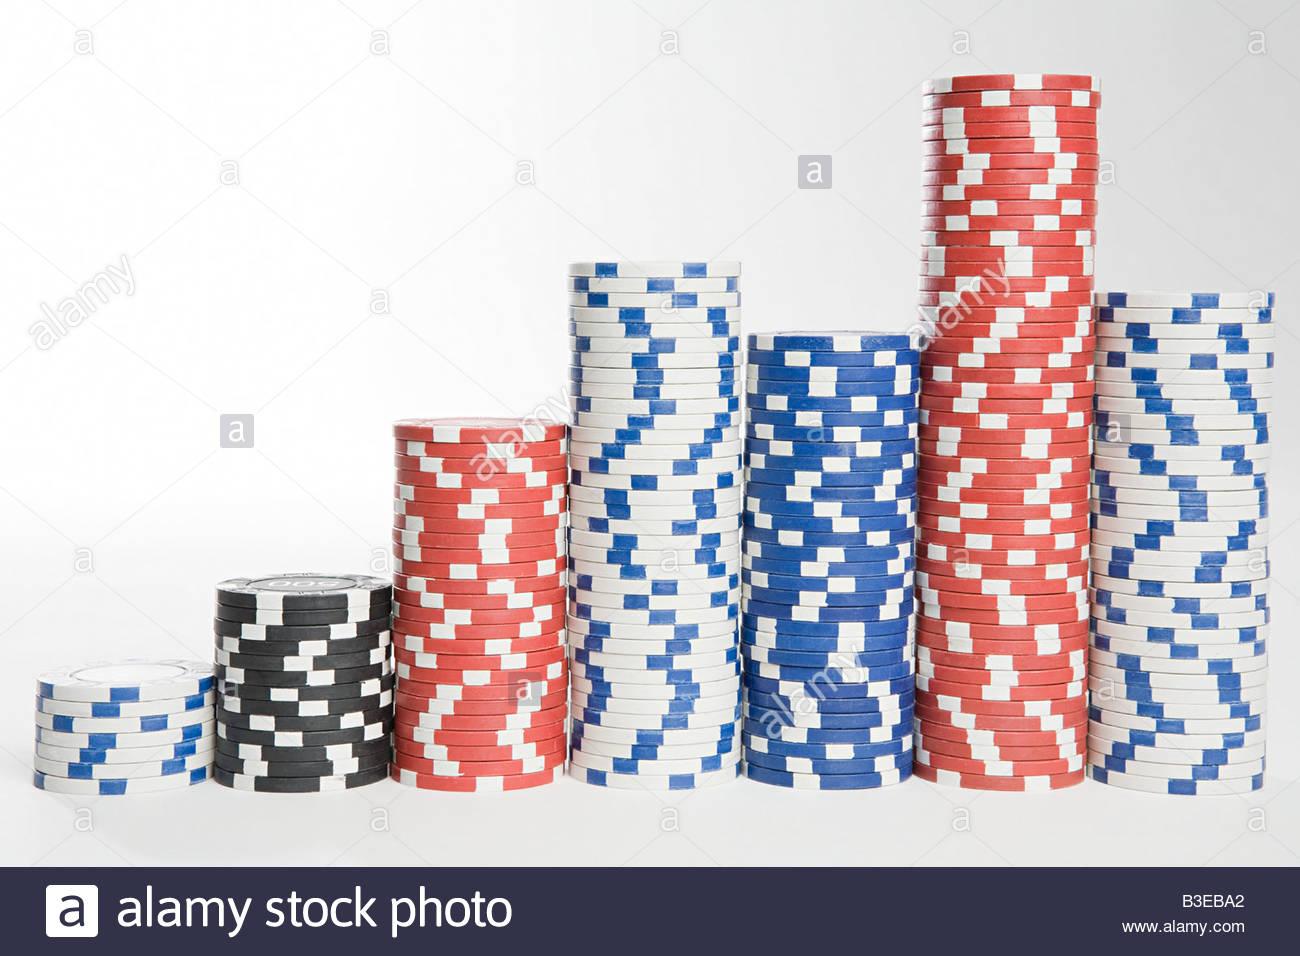 Piles of gambling chips - Stock Image